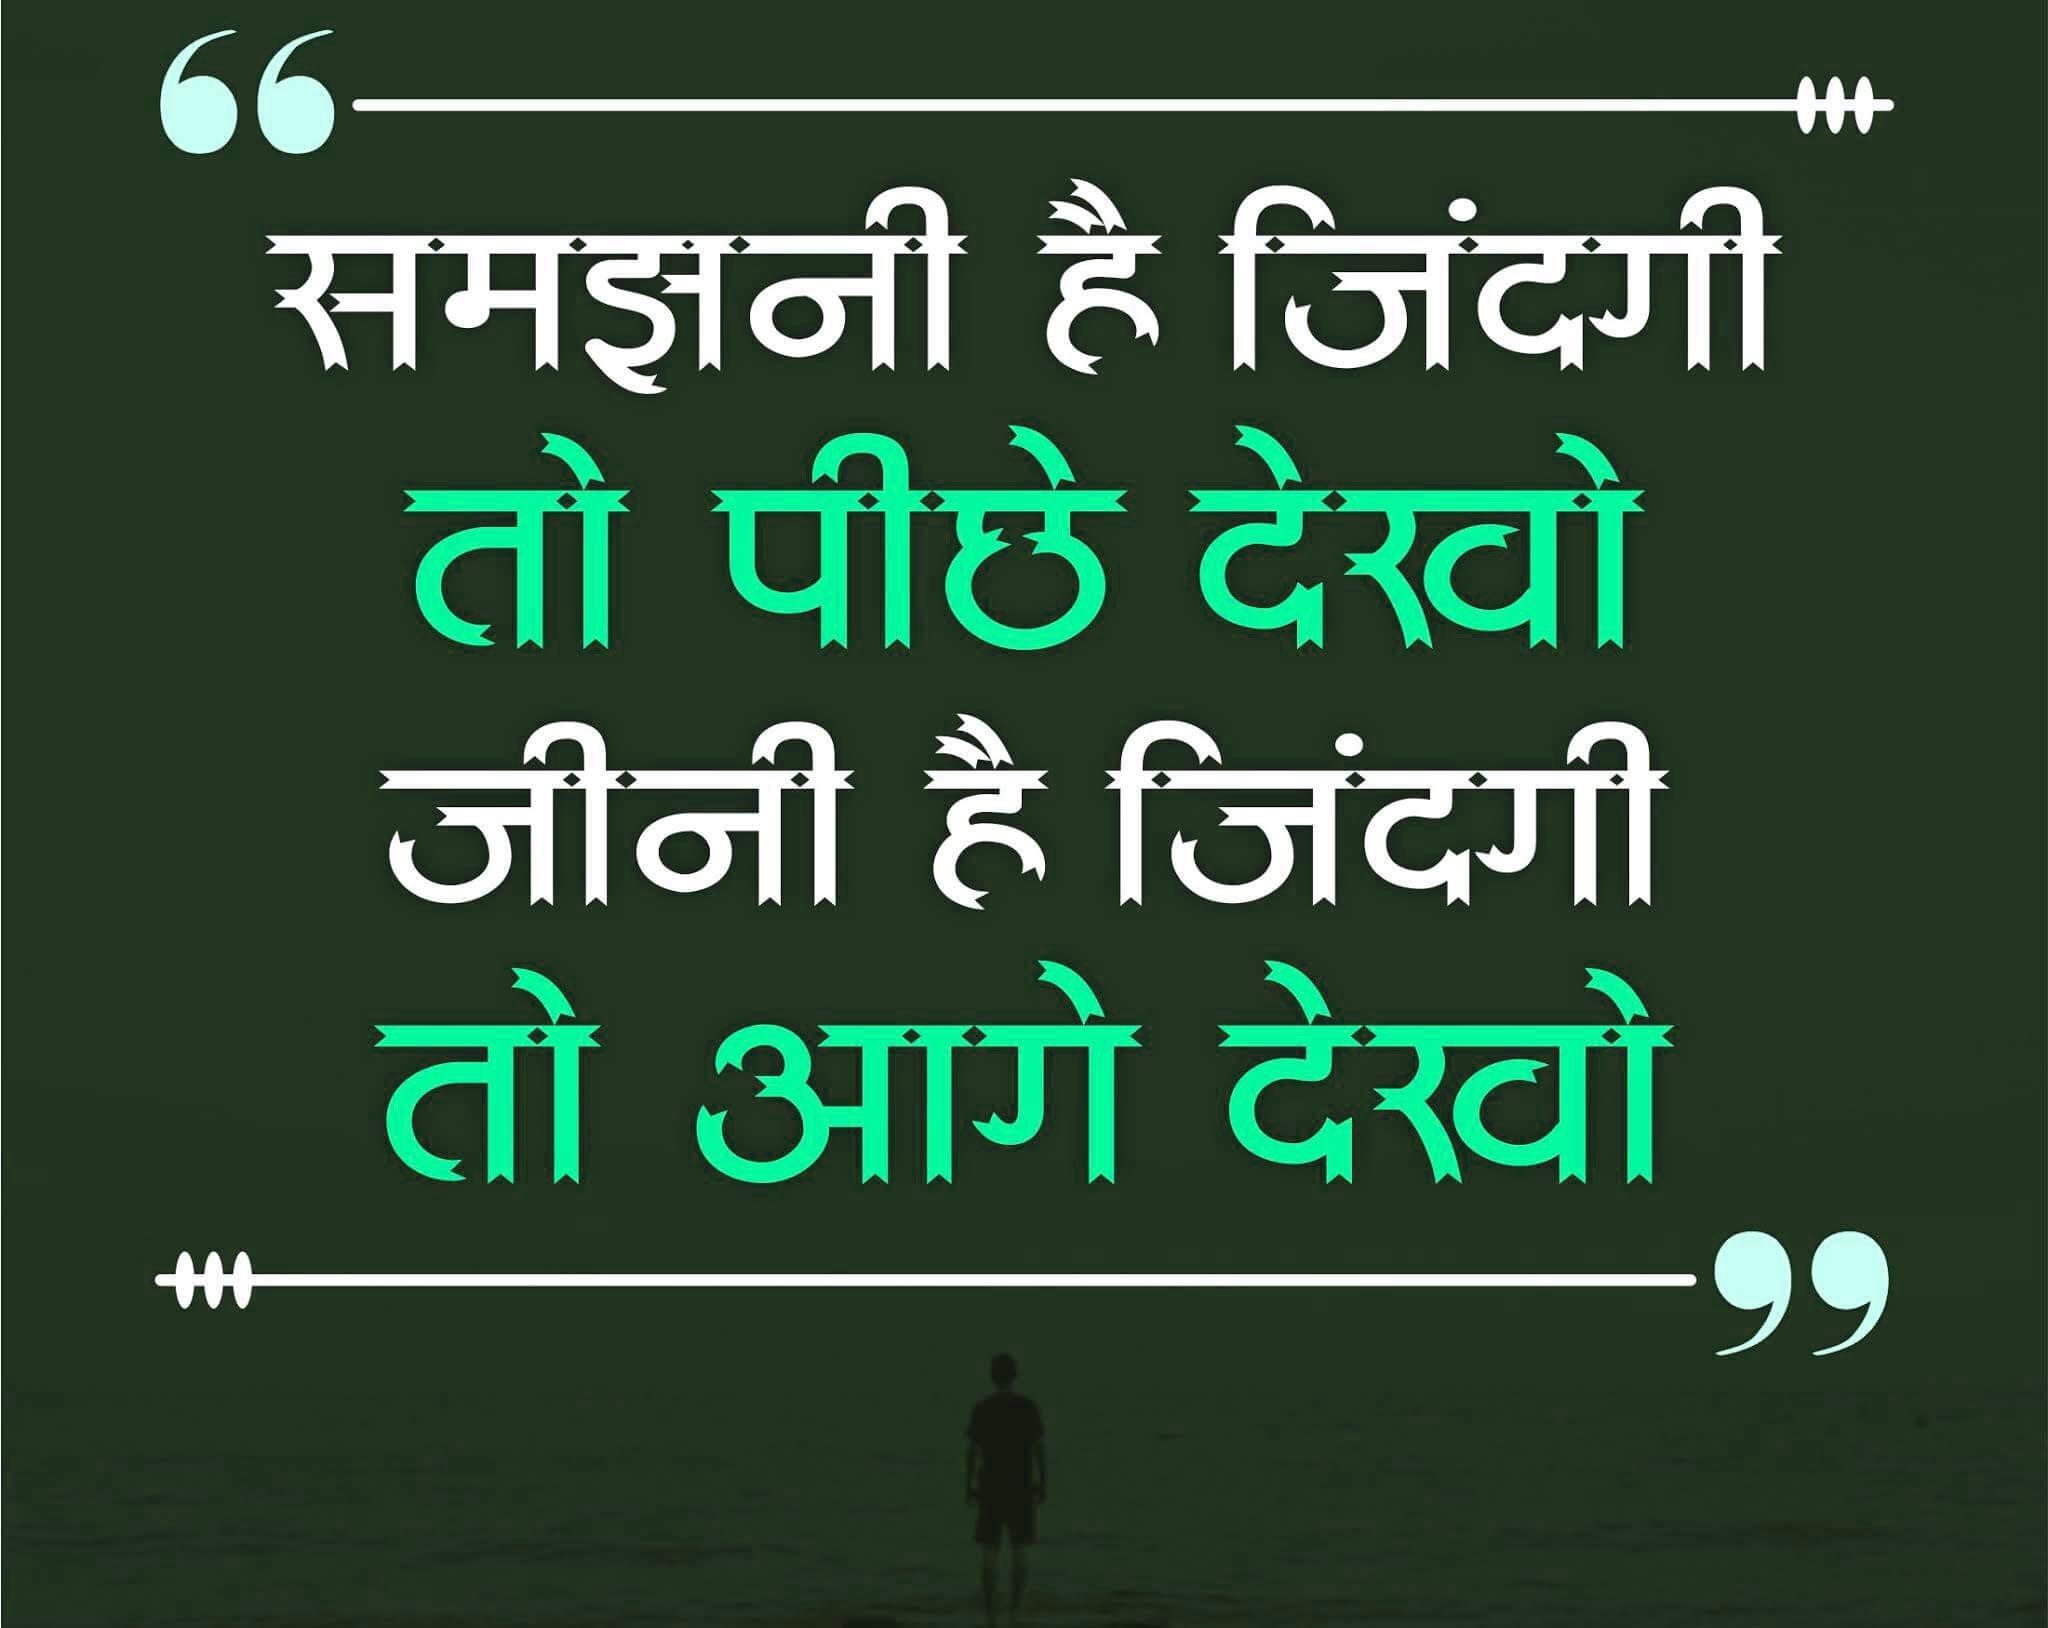 Hindi Motivational Quotes Wallpaper for Whatsapp